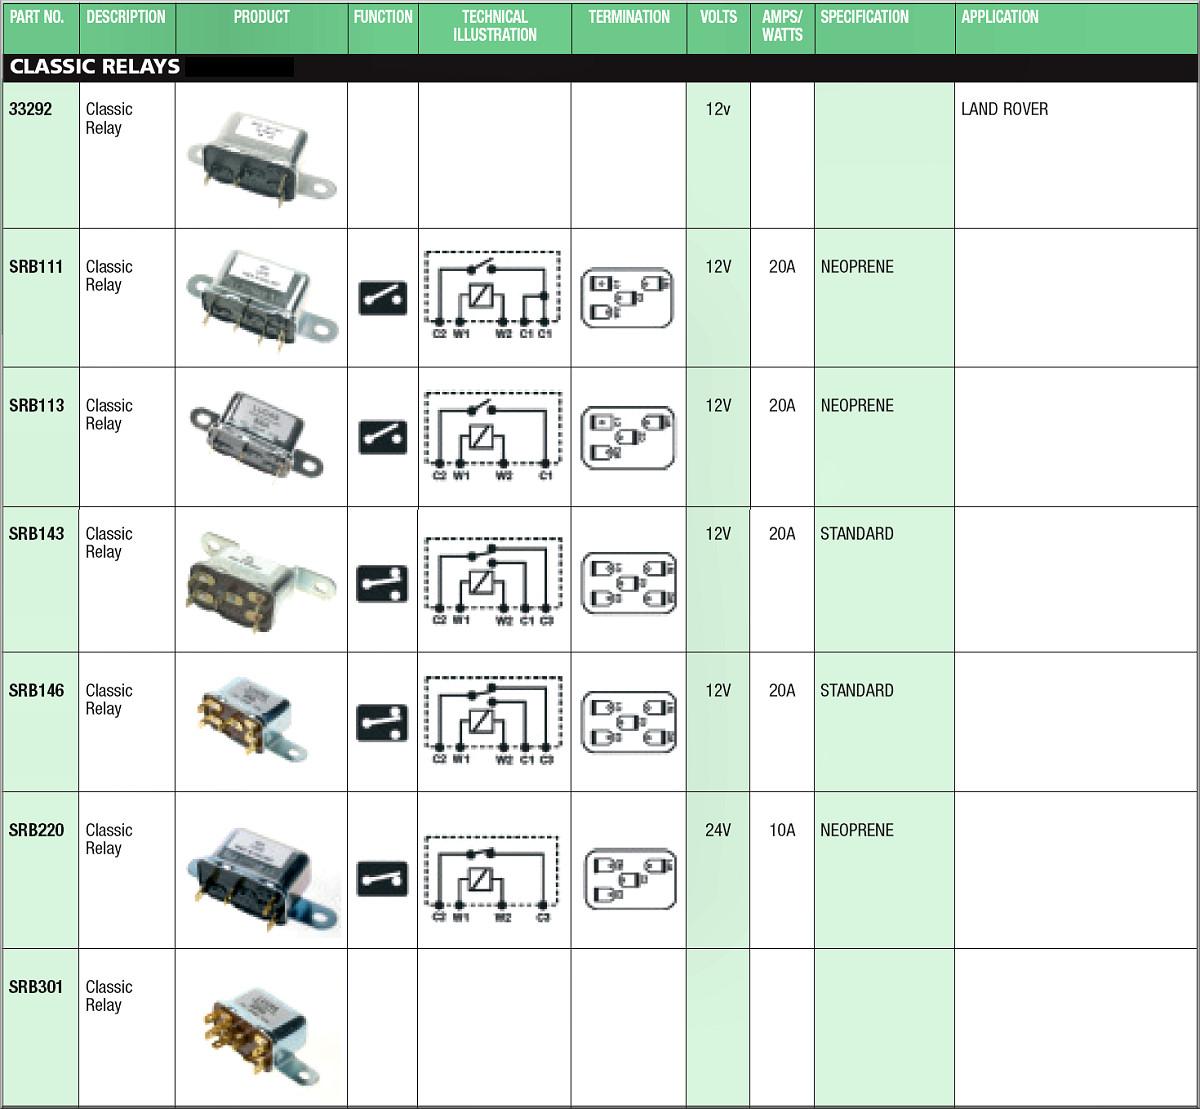 12v light switch wiring diagram 2000 mazda protege engine land rover lightweight